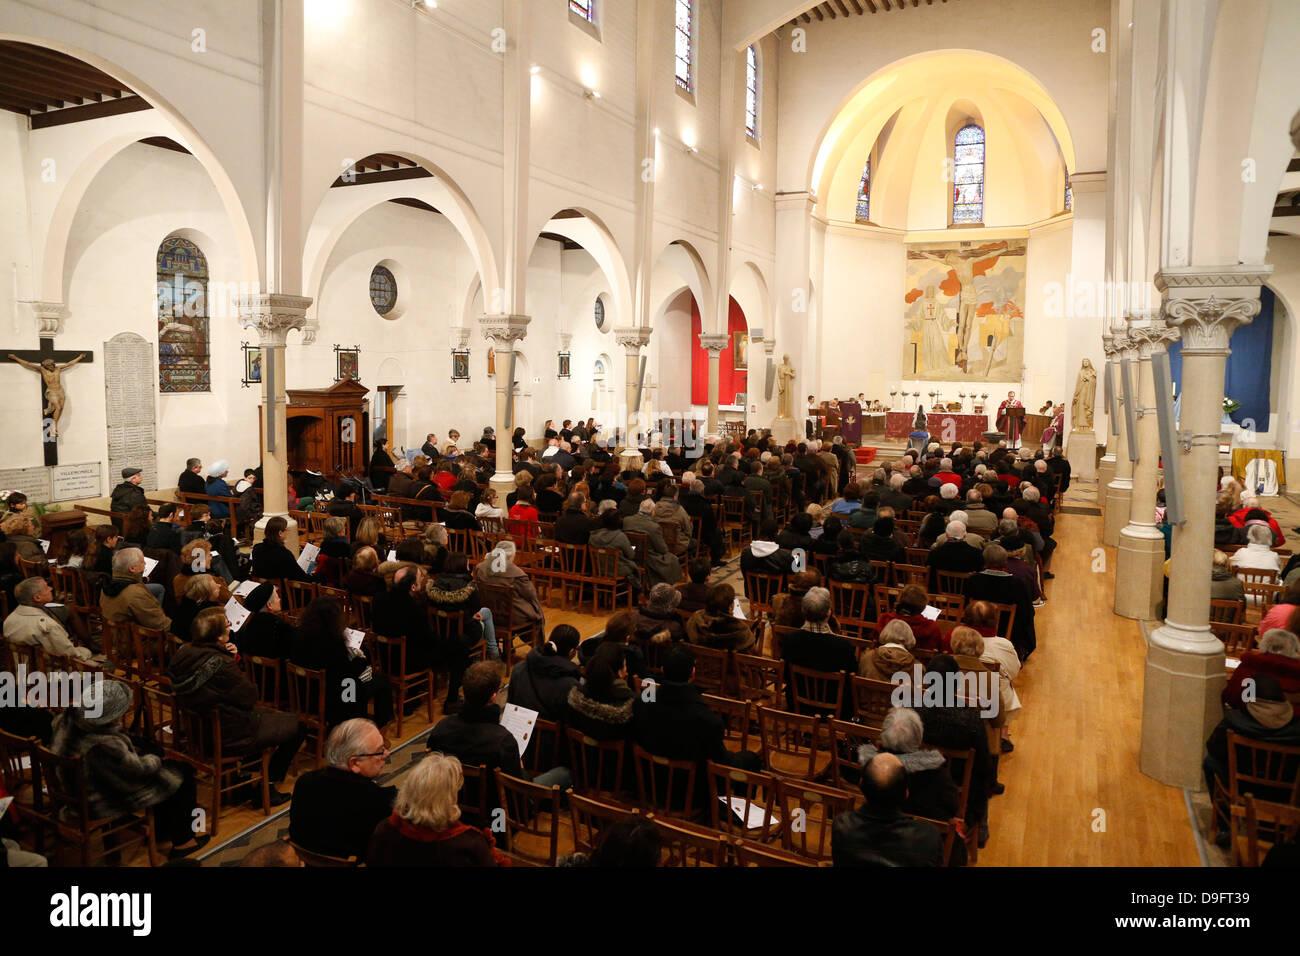 Sunday Mass, Villemomble, Seine-St. Denis, France - Stock Image